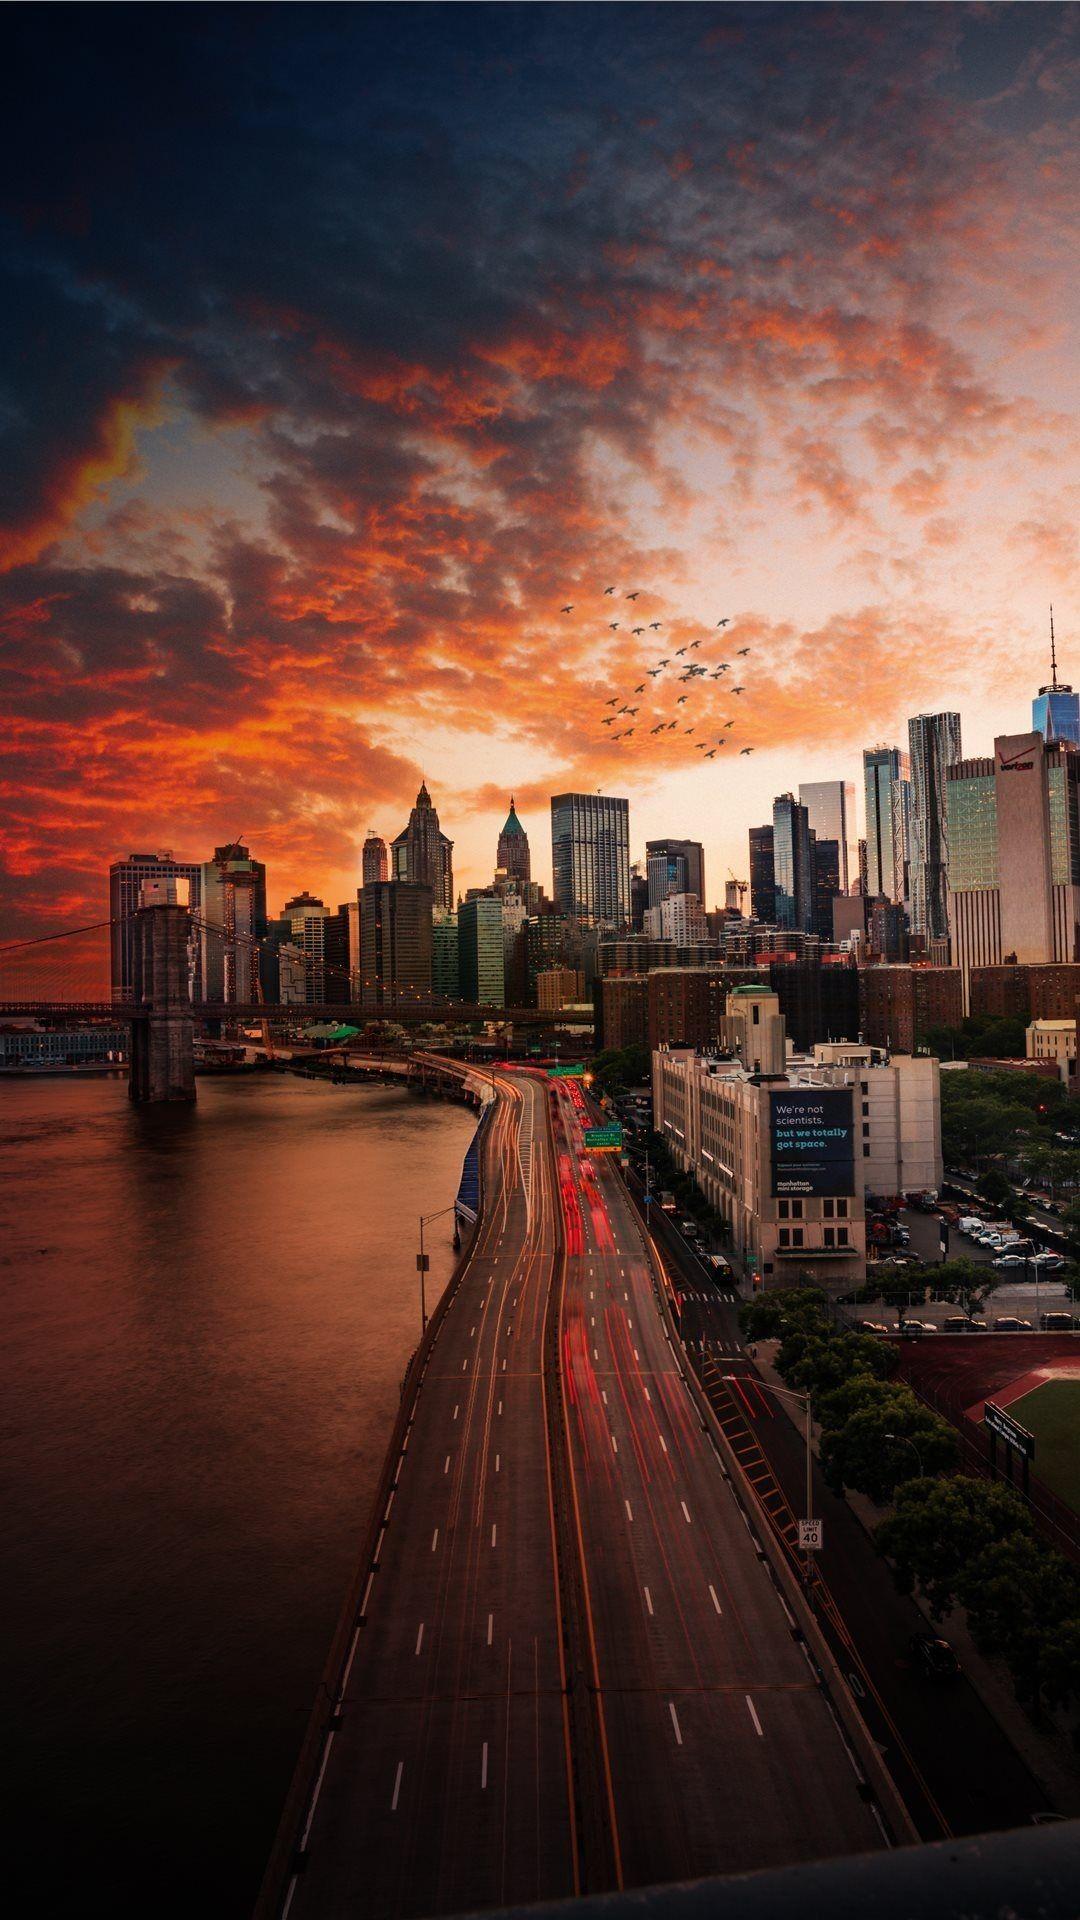 Luxury City Sunrise Wallpaper City Wallpaper New York Wallpaper Iphone Wallpaper Landscape